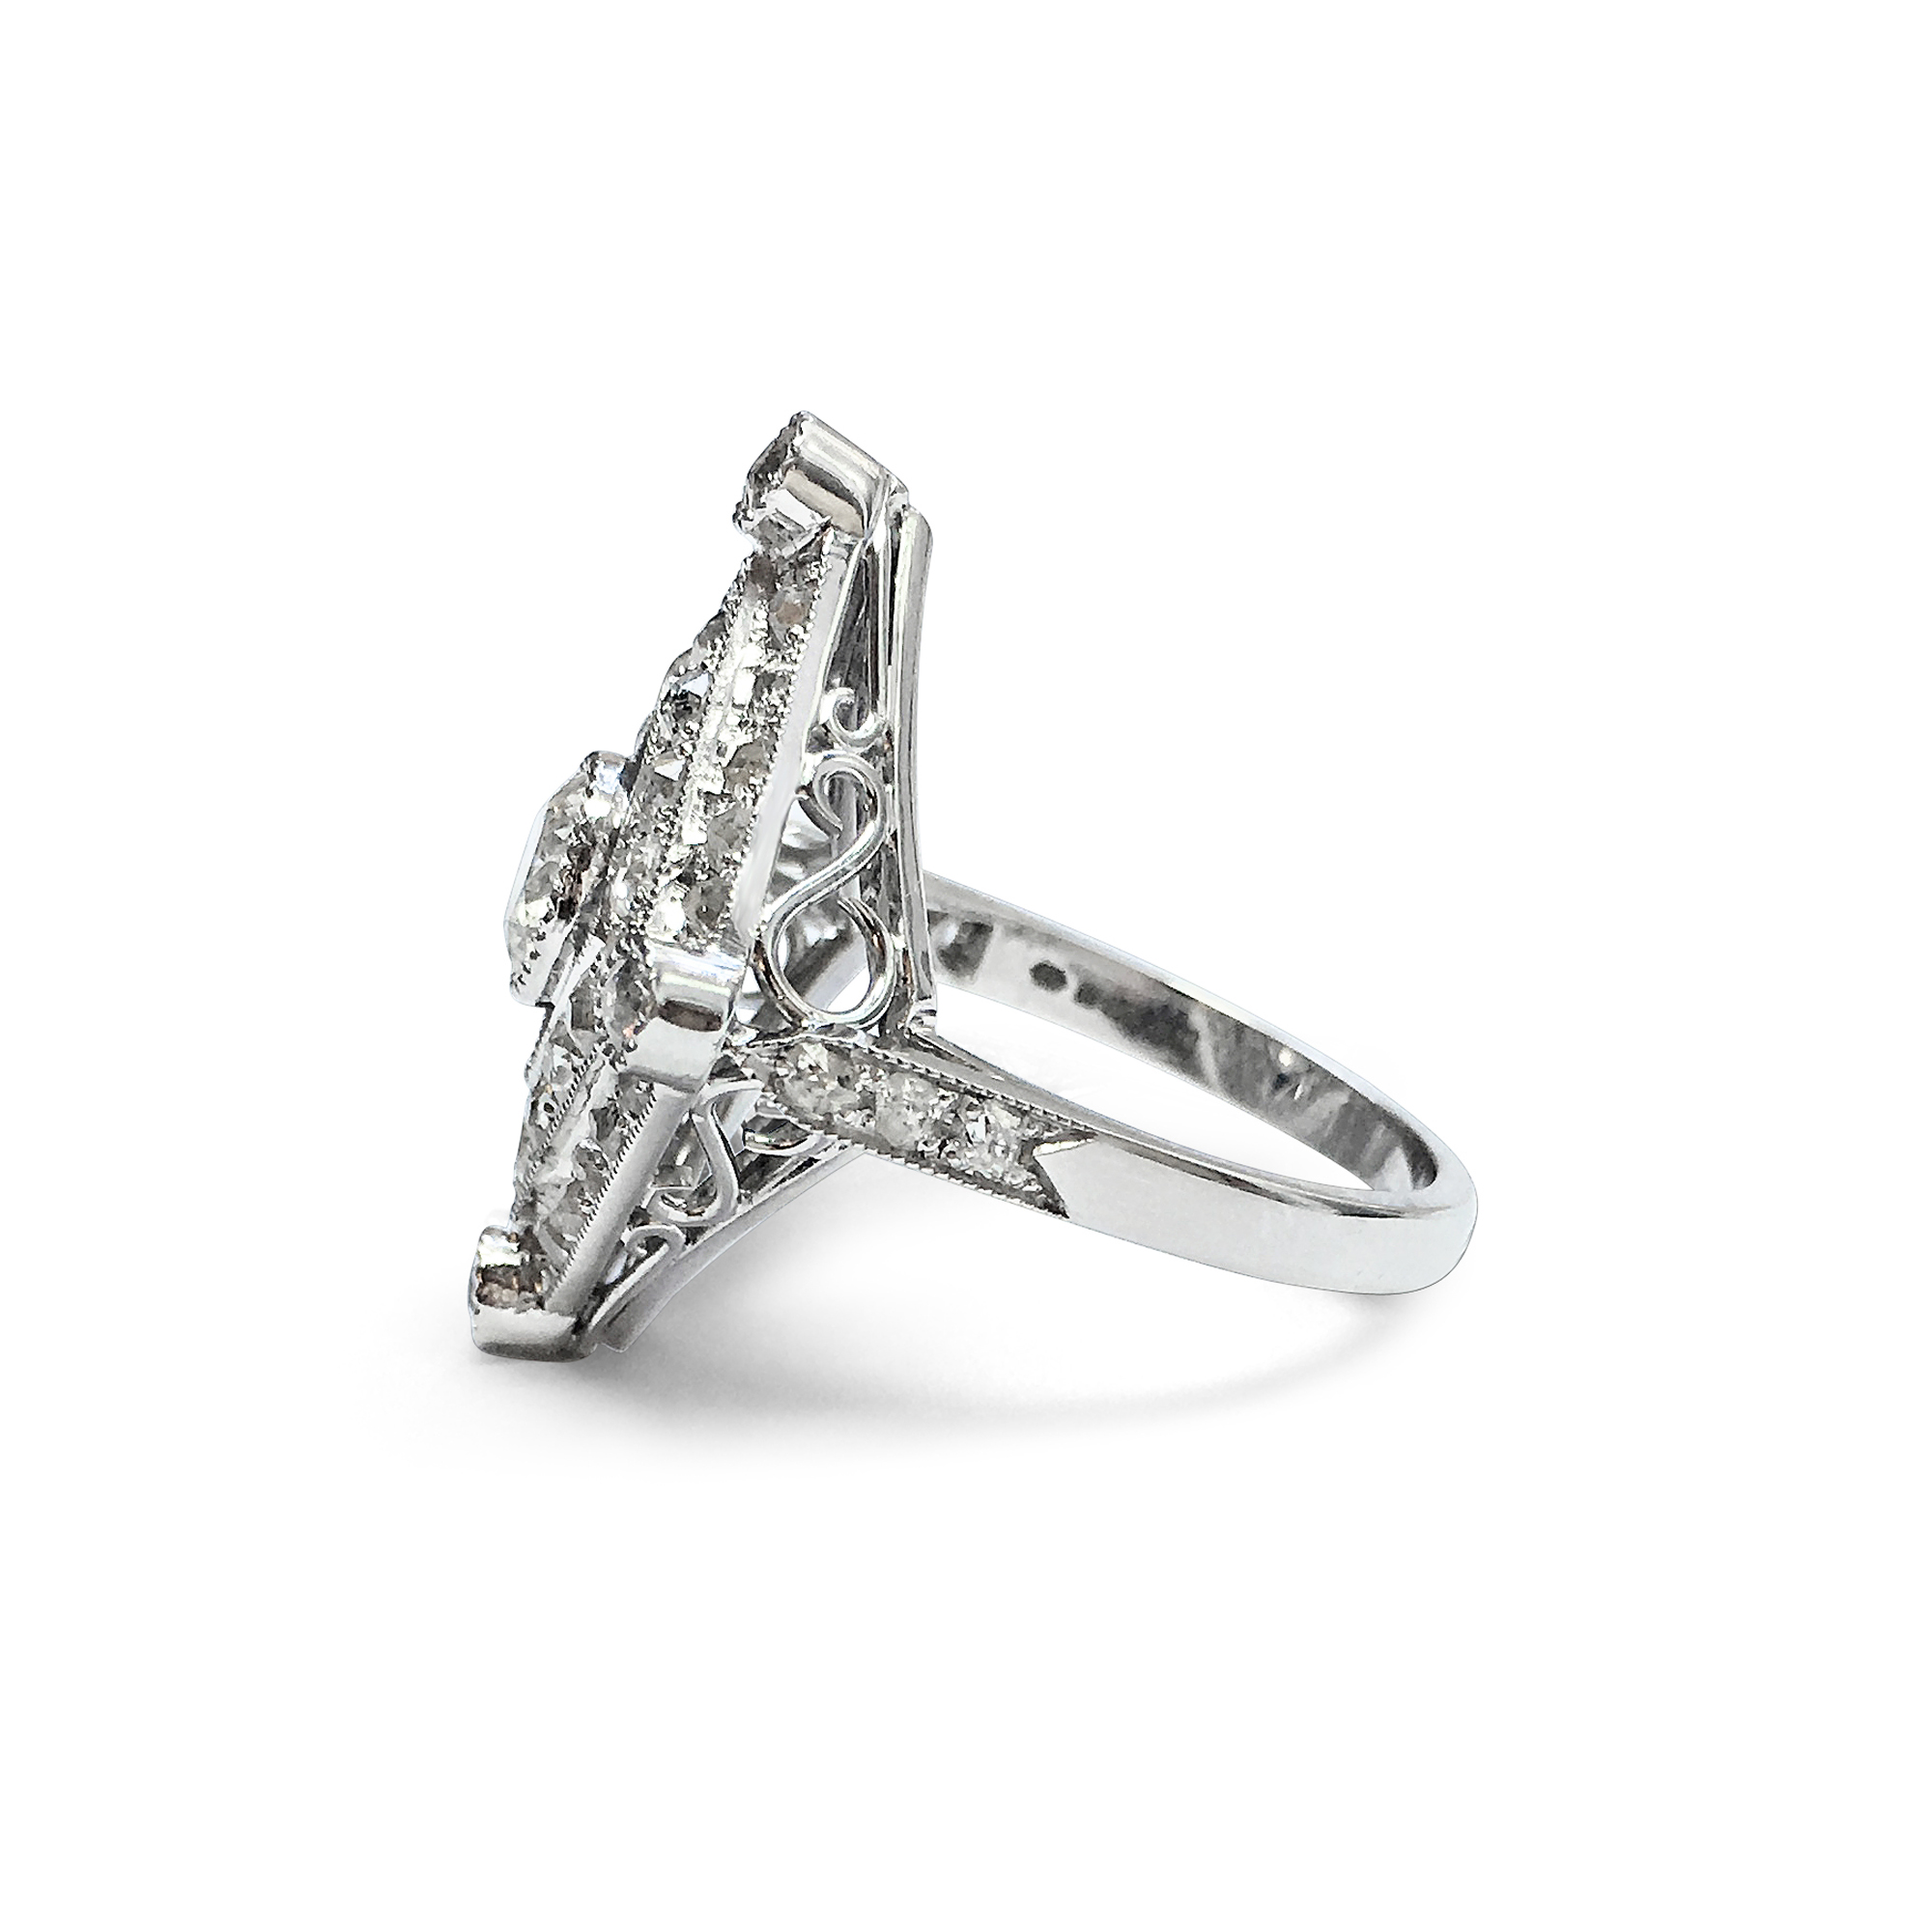 navette-shaped-diamond-ring-mounted-in-18ct-white-gold-2.jpg